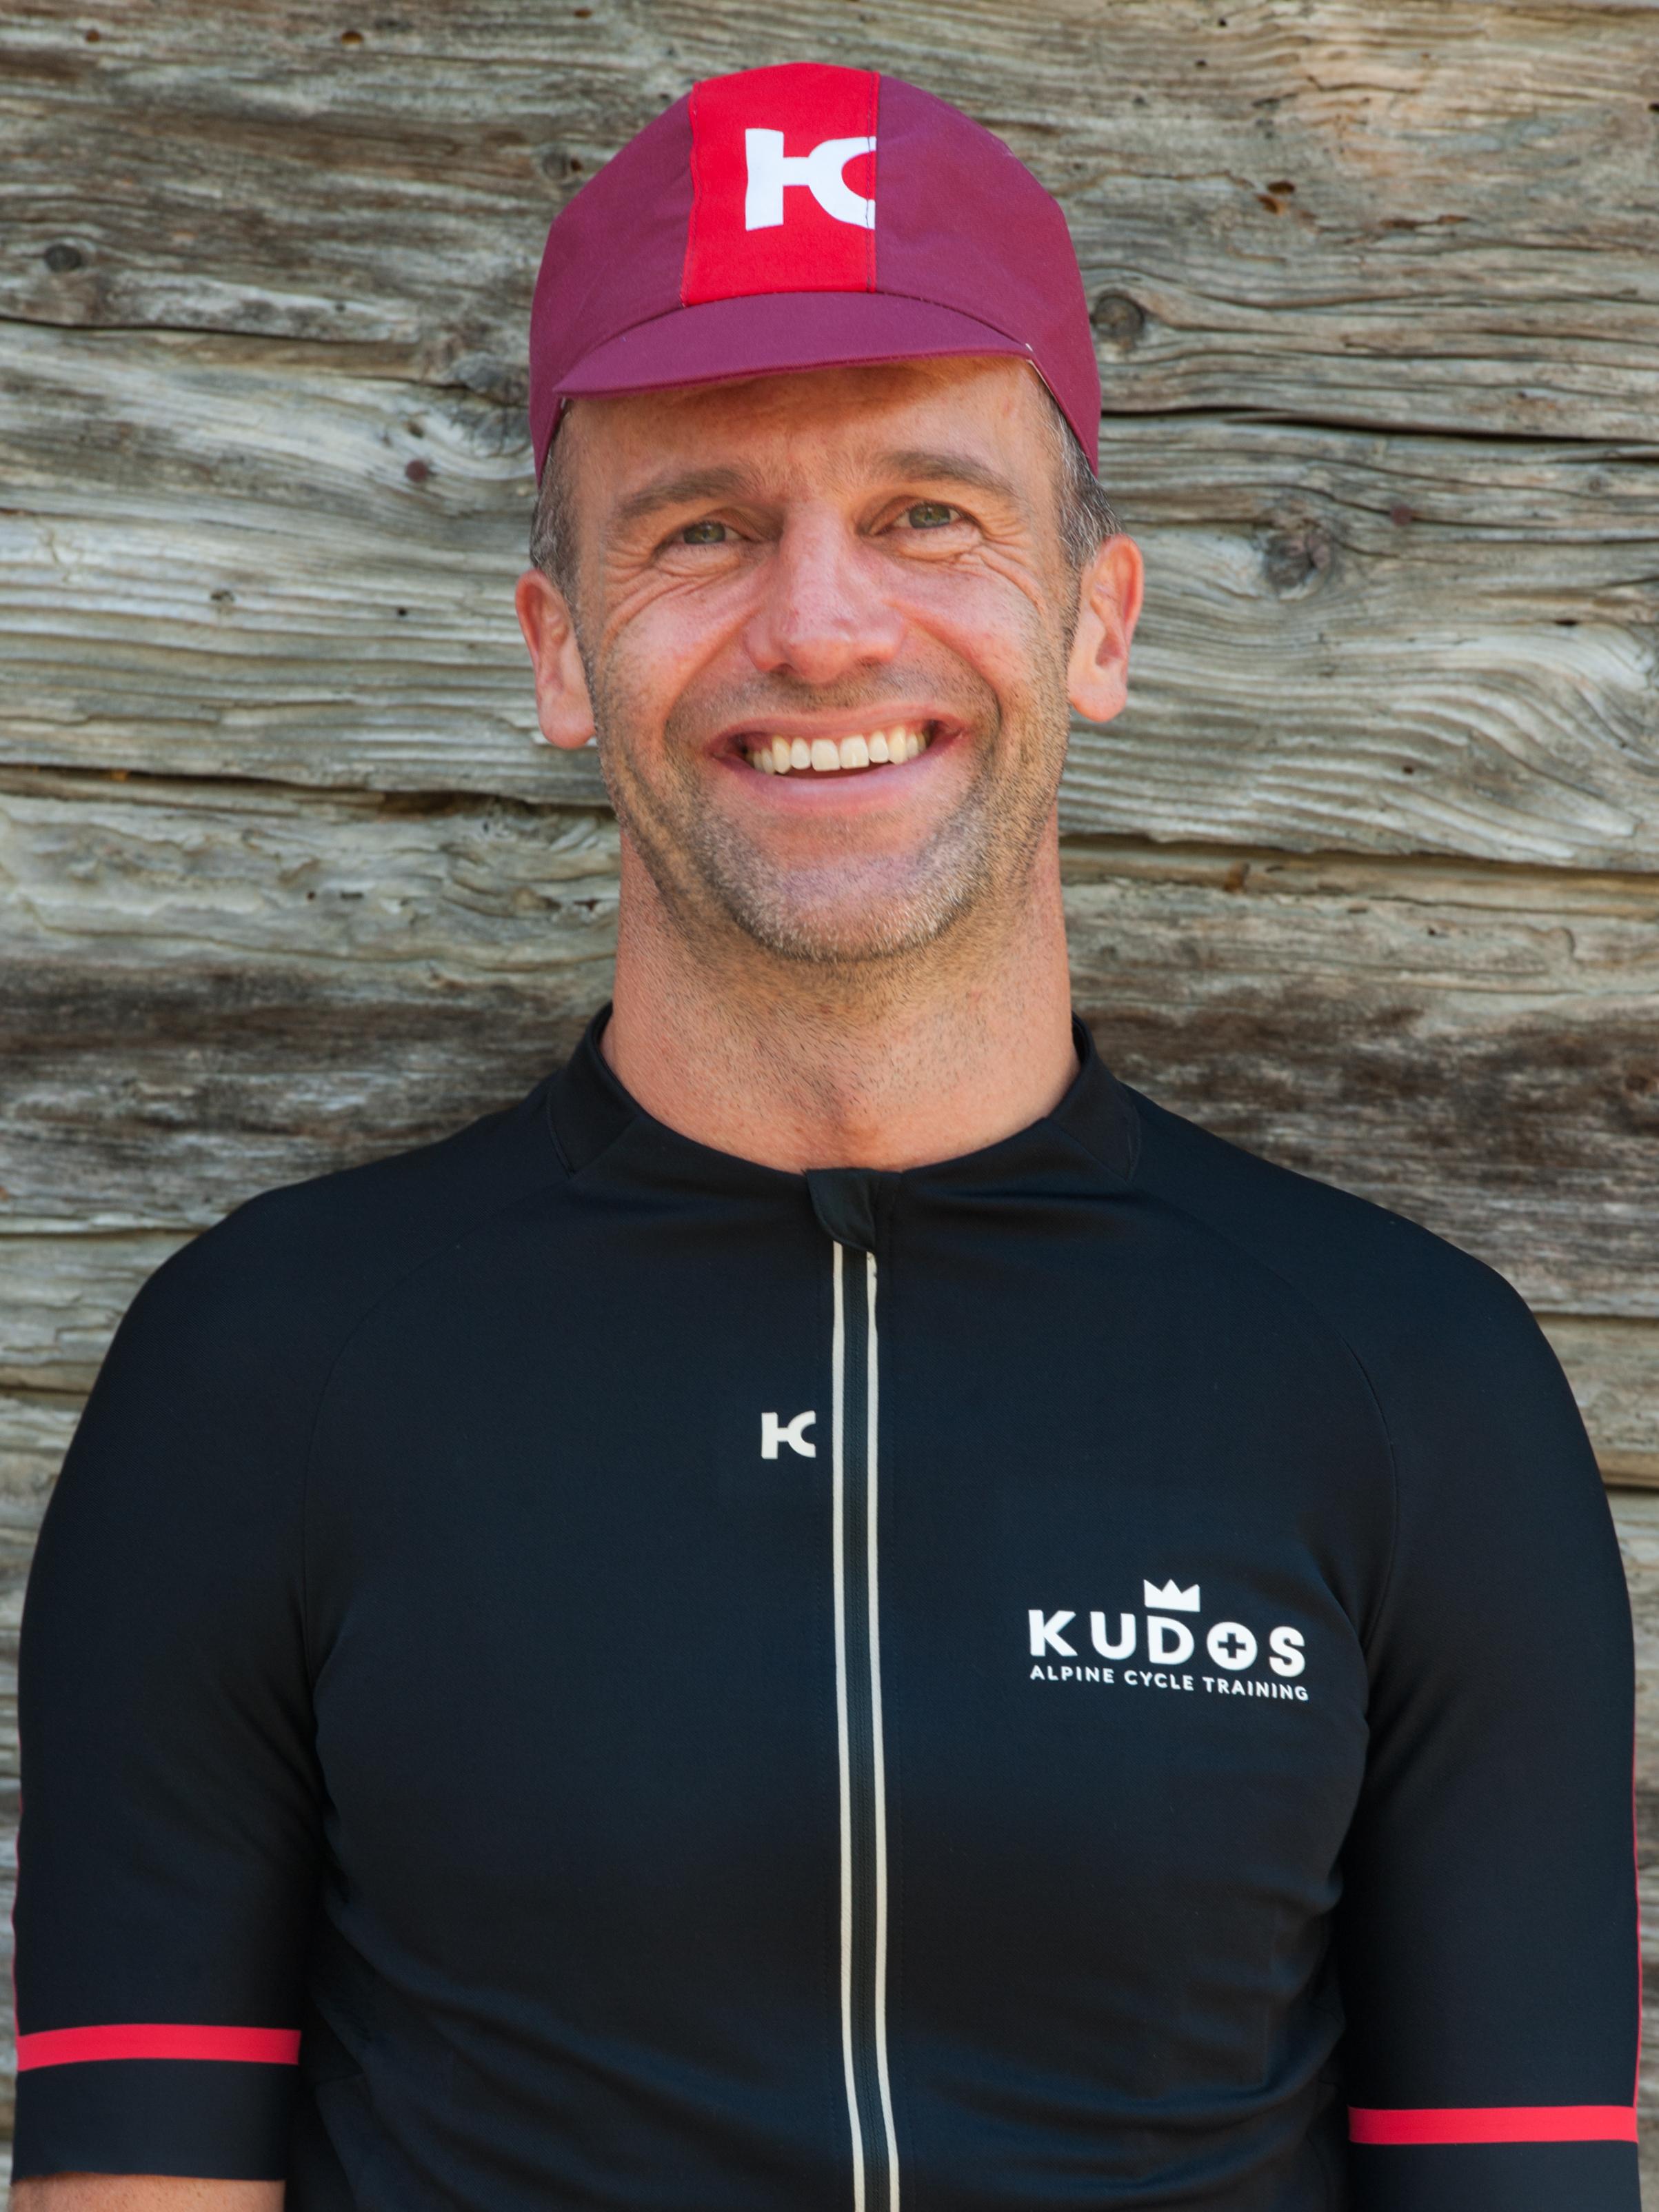 Rob Spears Kudos Cycling